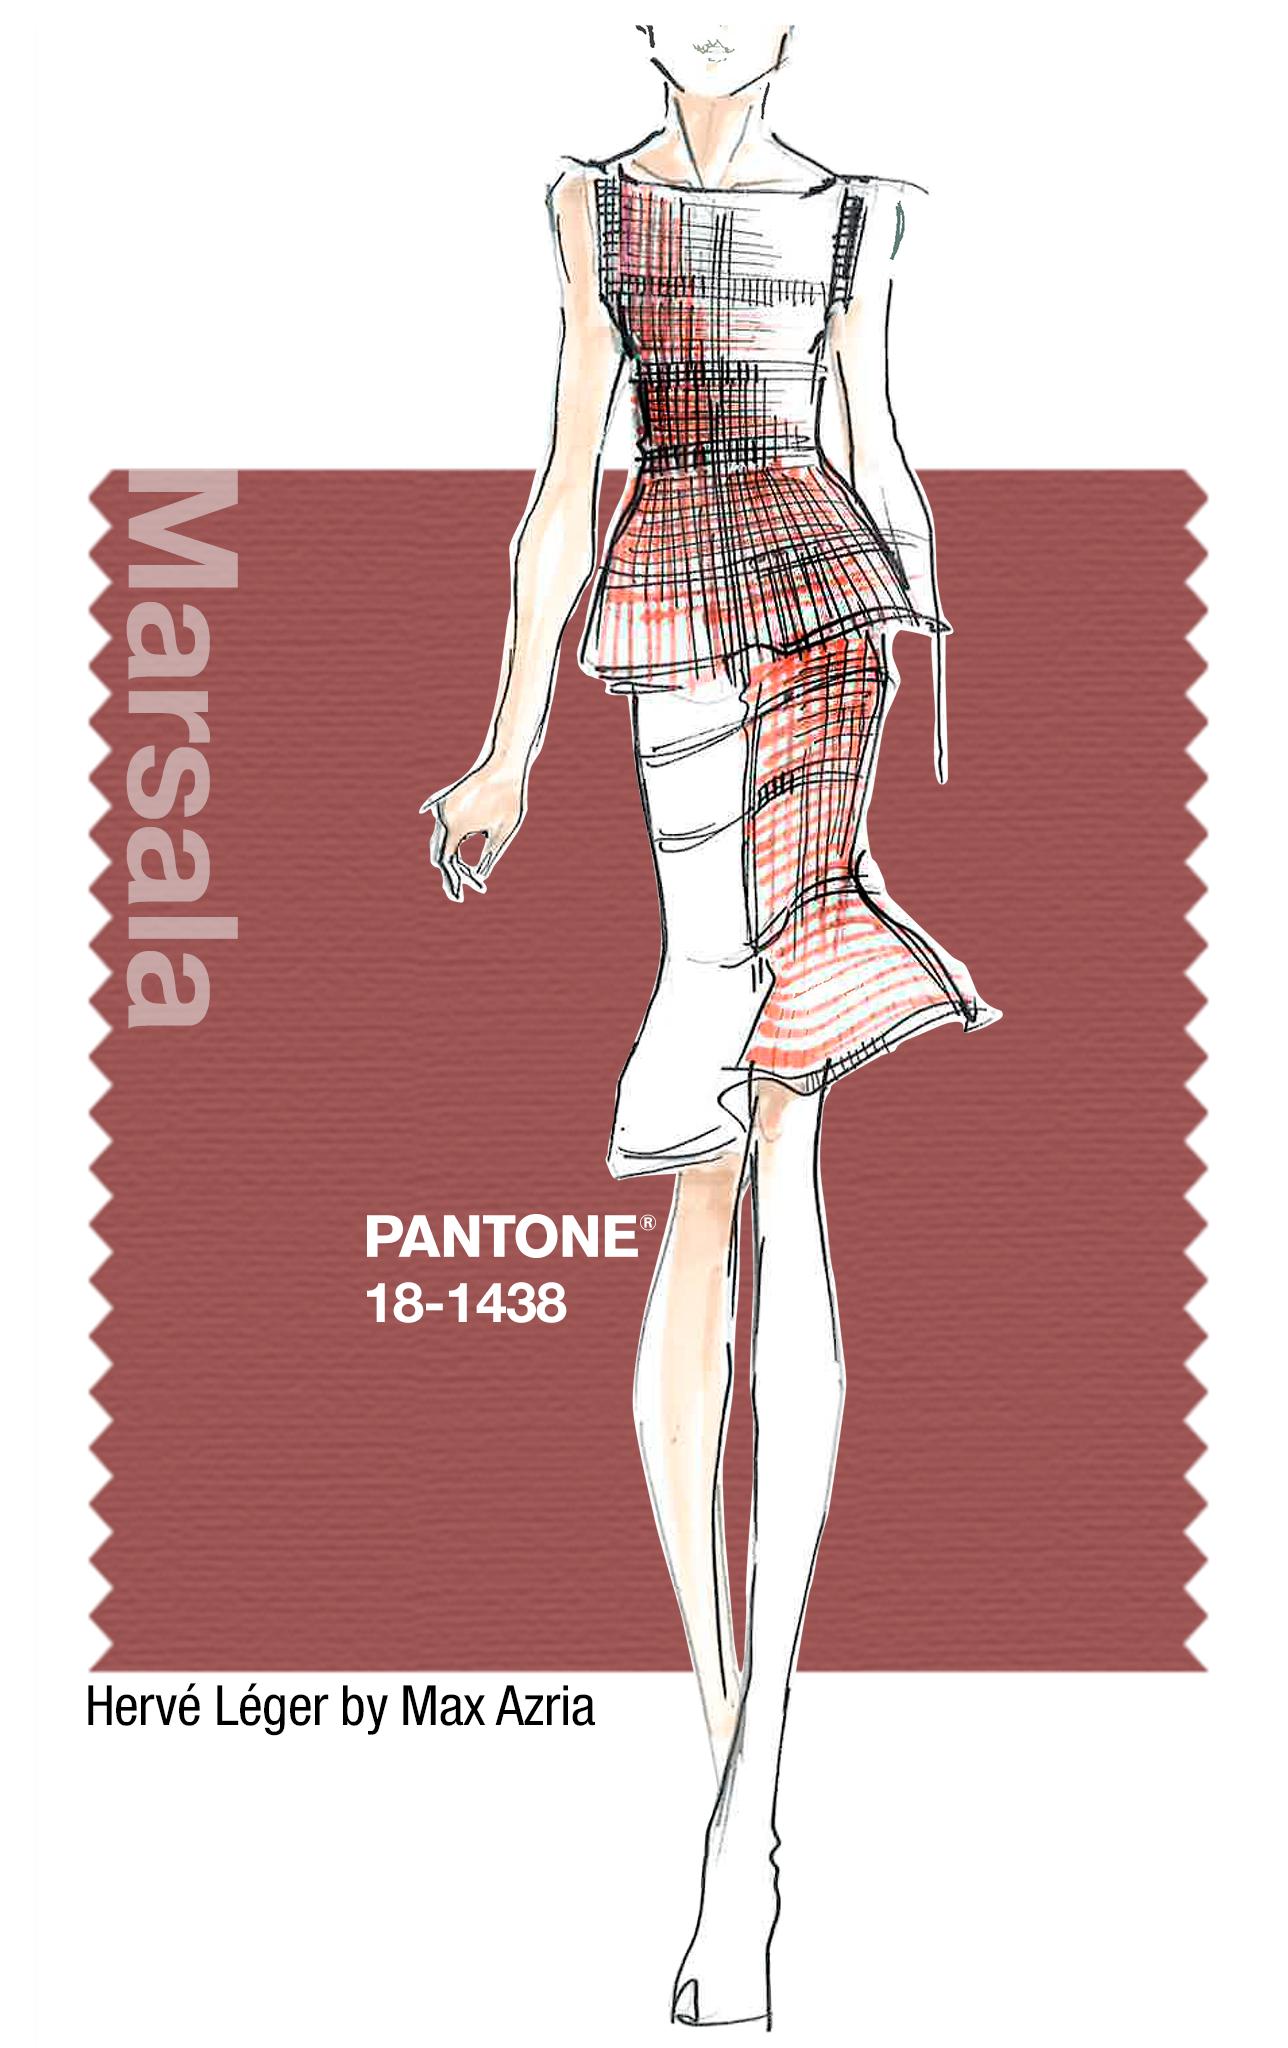 Search Pantone Color Badfbdffa